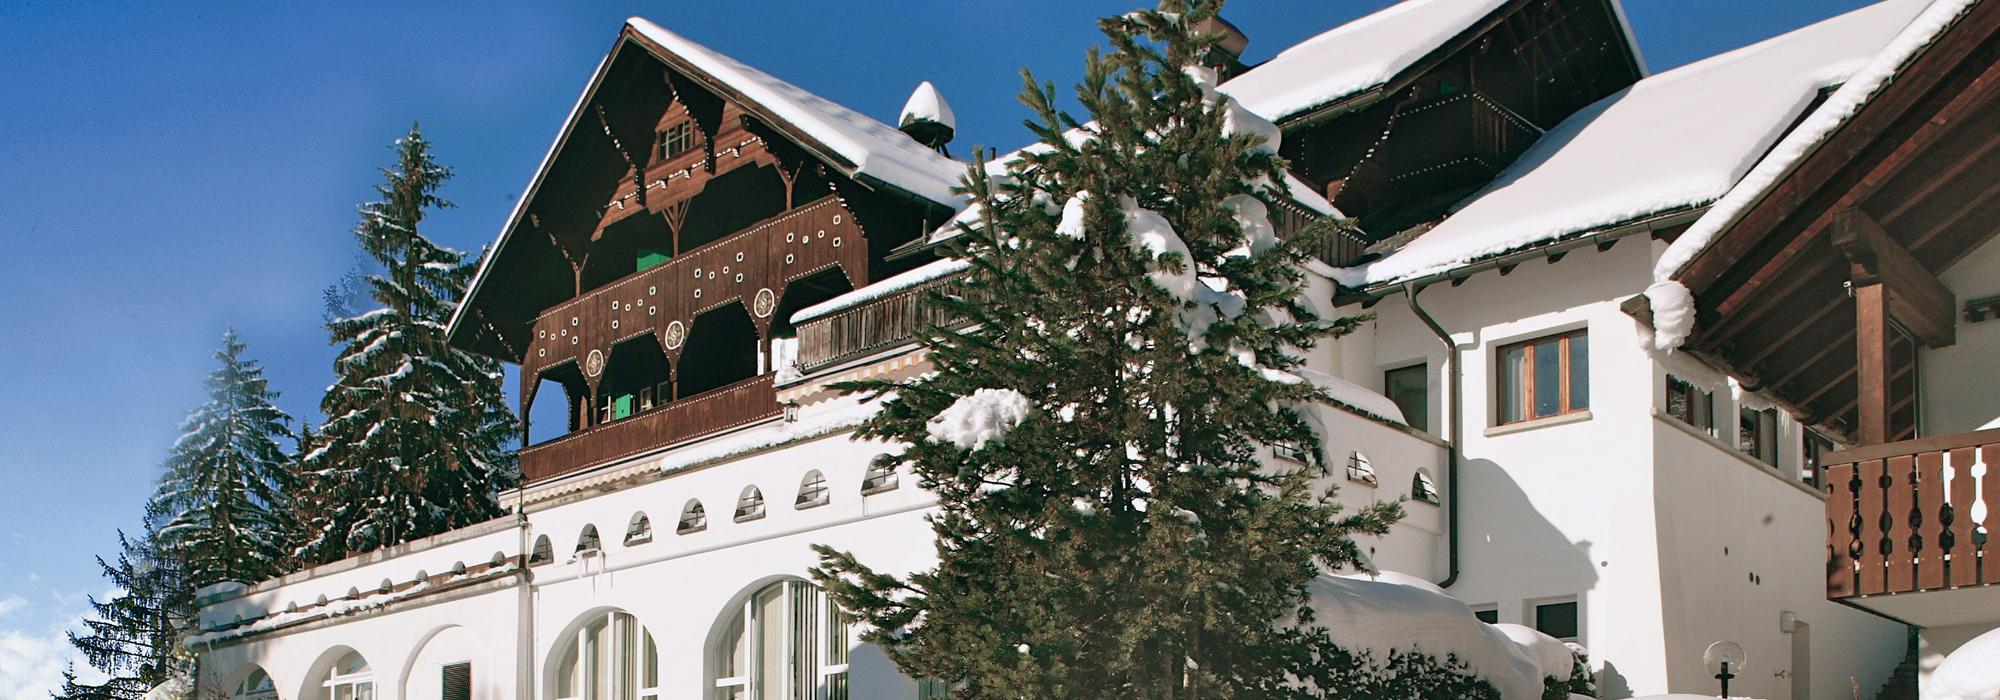 Hotel Fidazerhof Flims/Laax